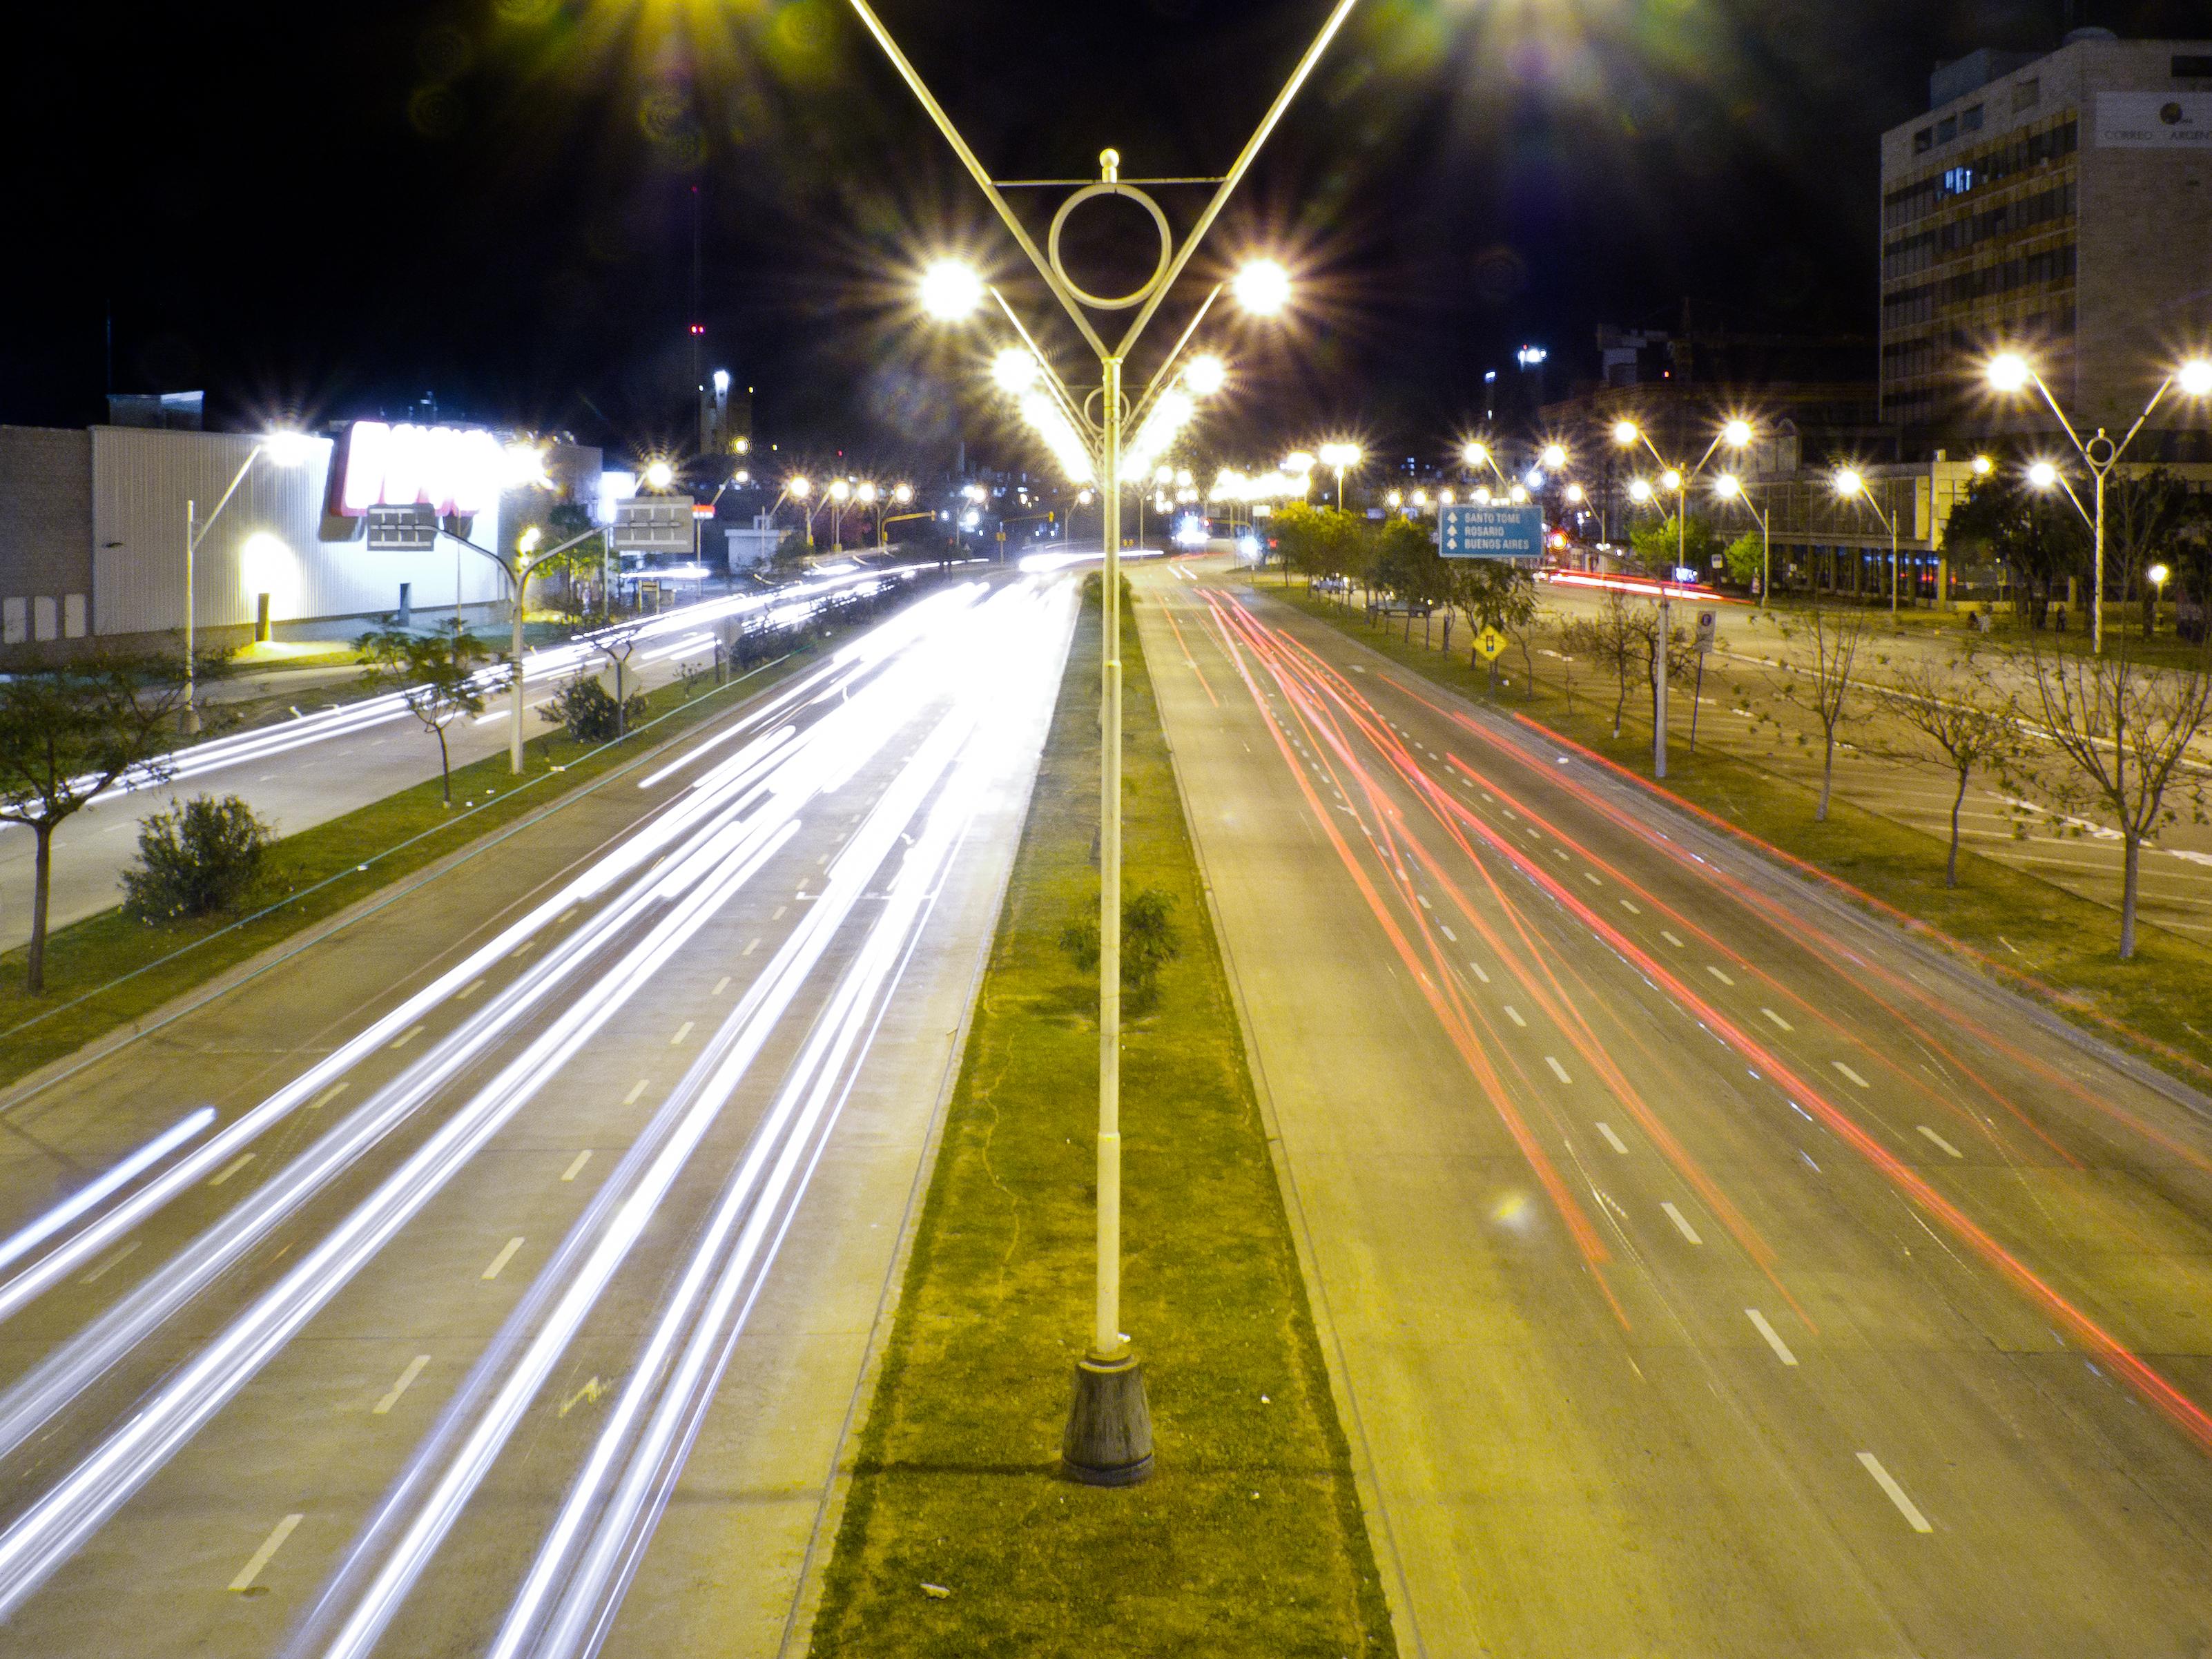 Shedding Light On A Problem. u201c & GE Spotlights New Smart Street Lamps | TechCrunch